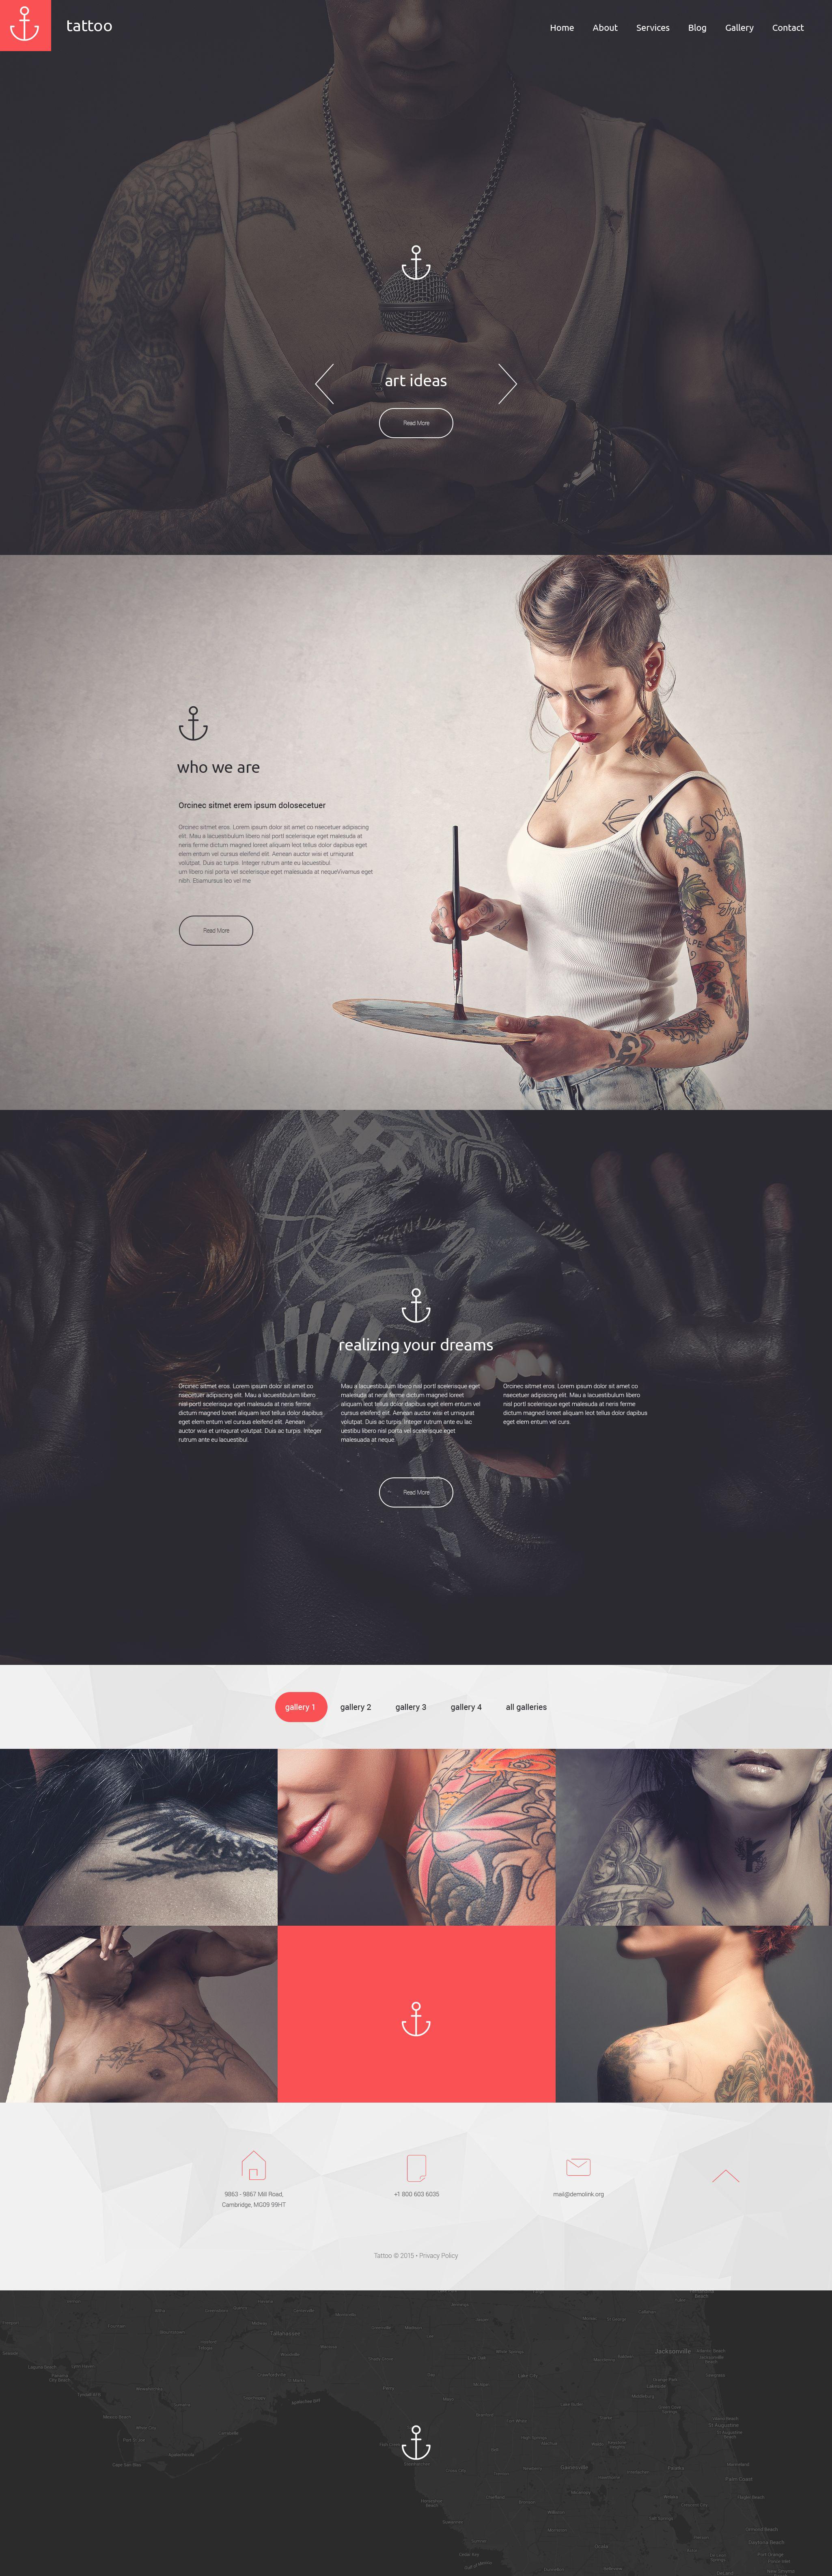 """Tattoo"" - адаптивний Drupal шаблон №55364"